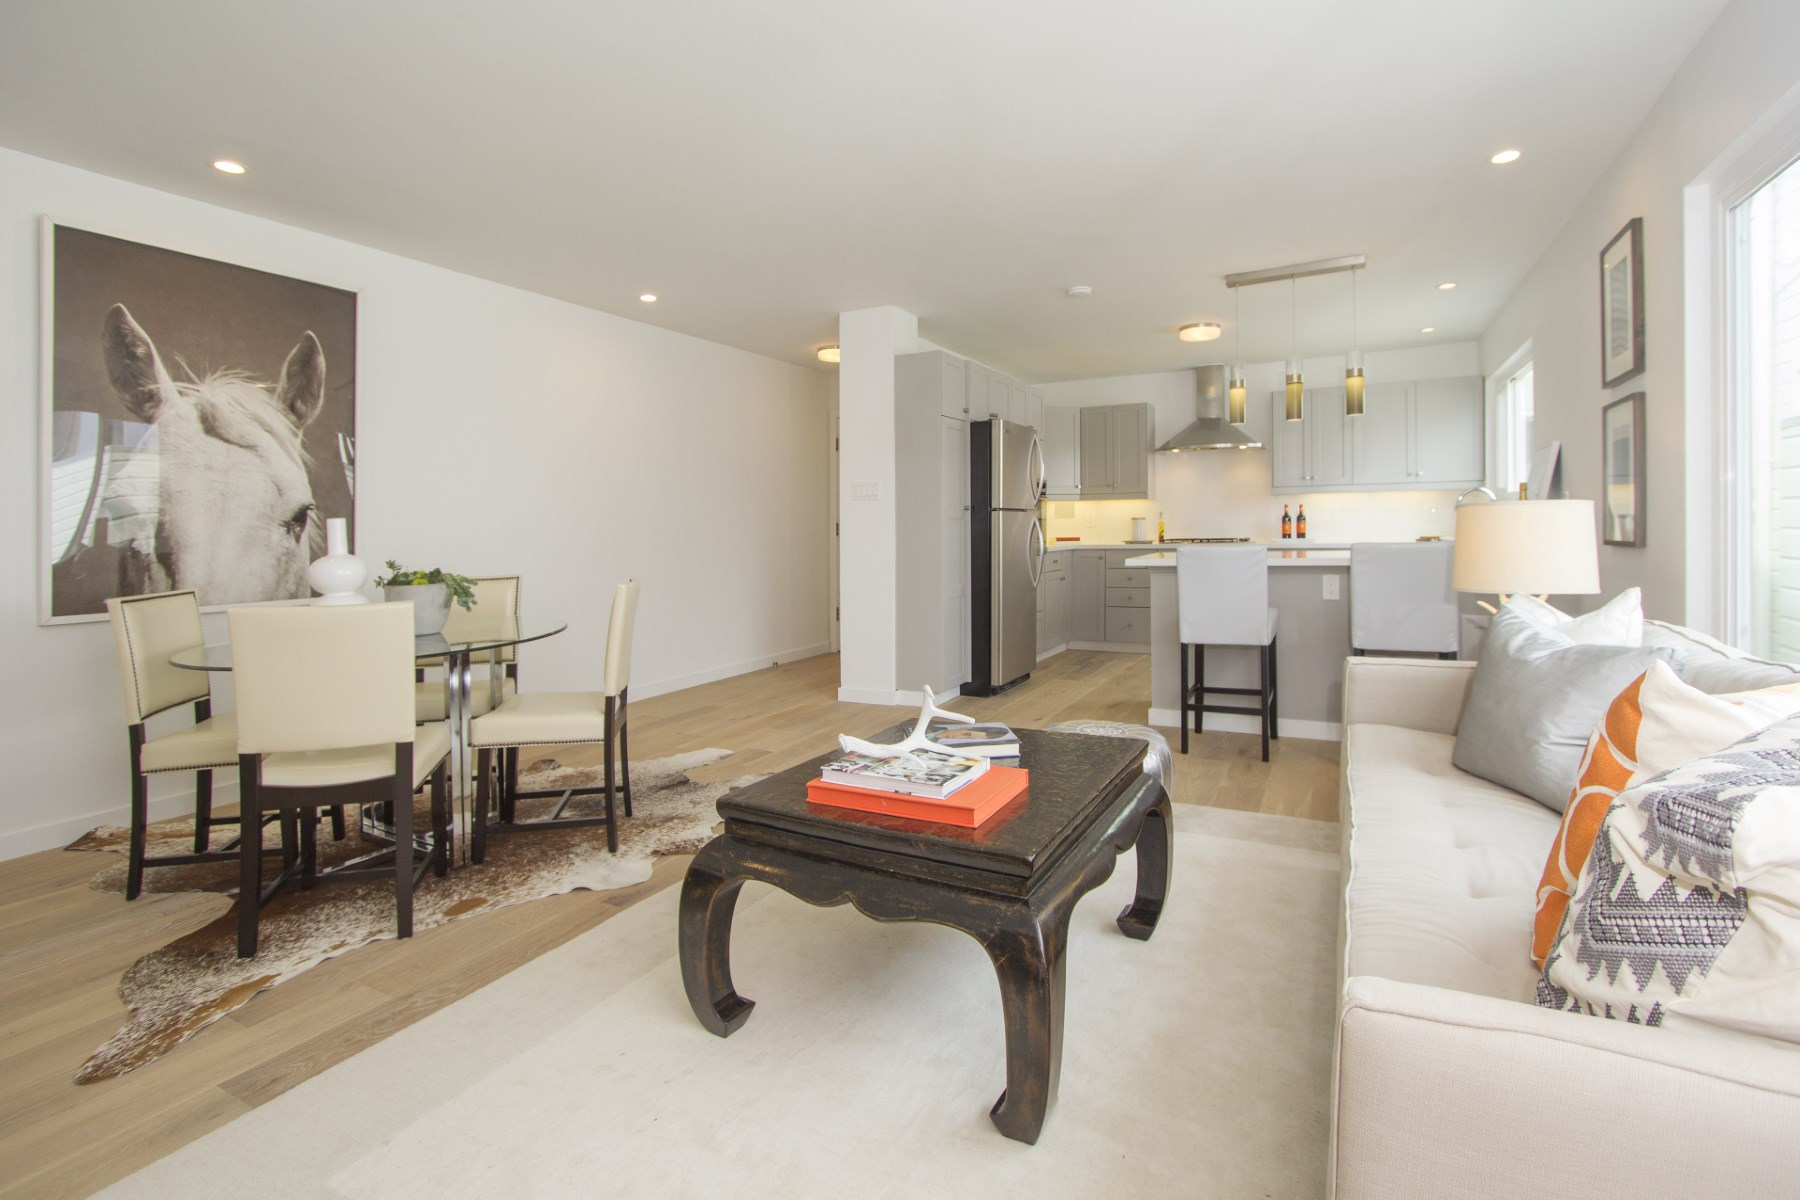 Condominium for Sale at Top Floor Modern Remodel Condo 1541 Filbert St Apt 5 Cow Hollow, San Francisco, California, 94123 United States